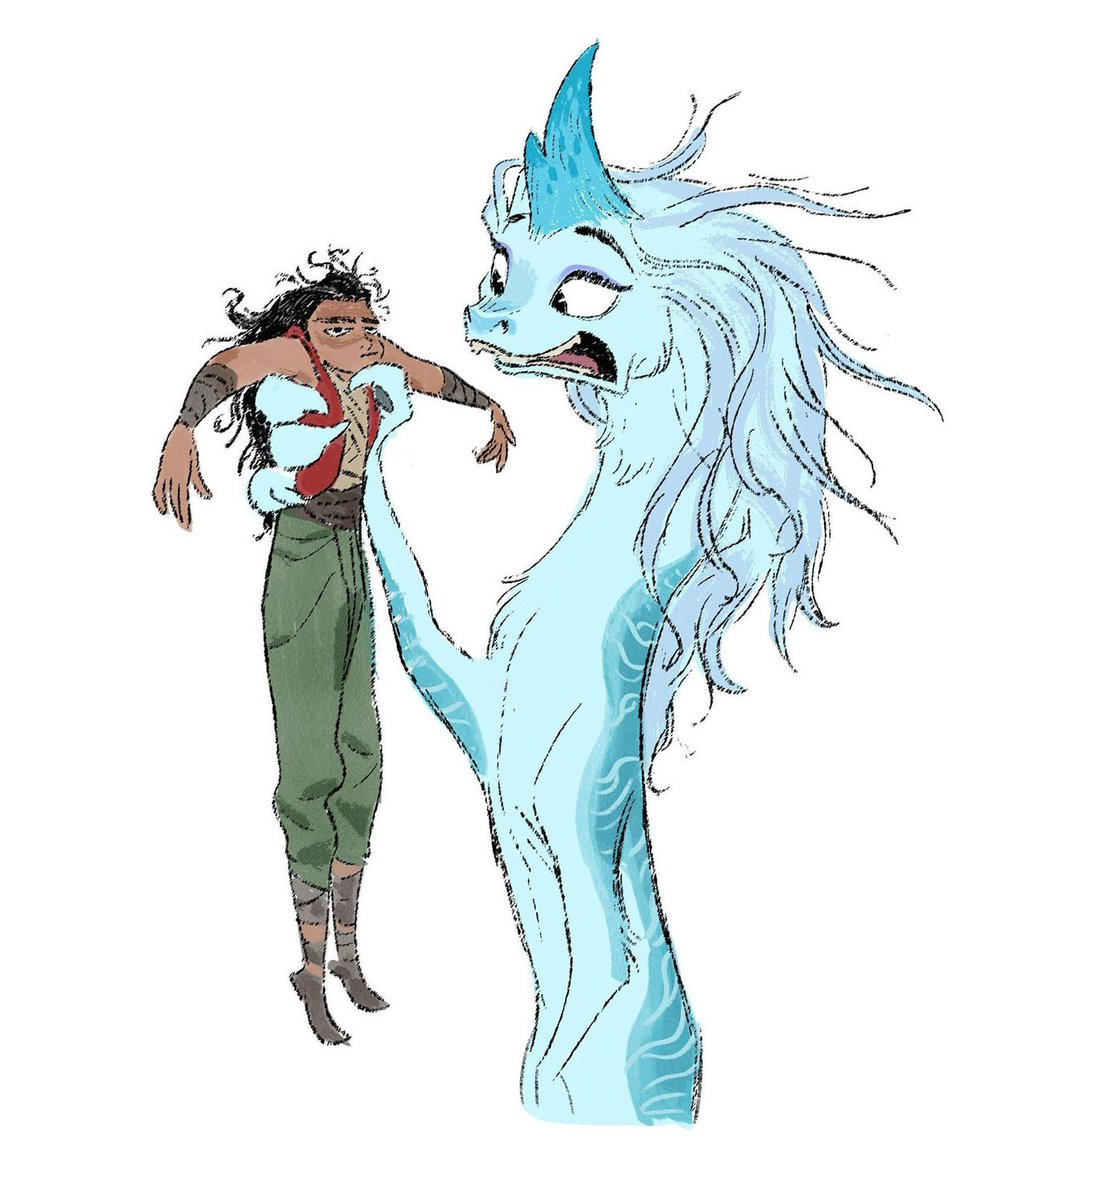 Raya et le Dernier Dragon [Walt Disney - 2021] - Page 23 Ev3dIlLWQAMXDNV